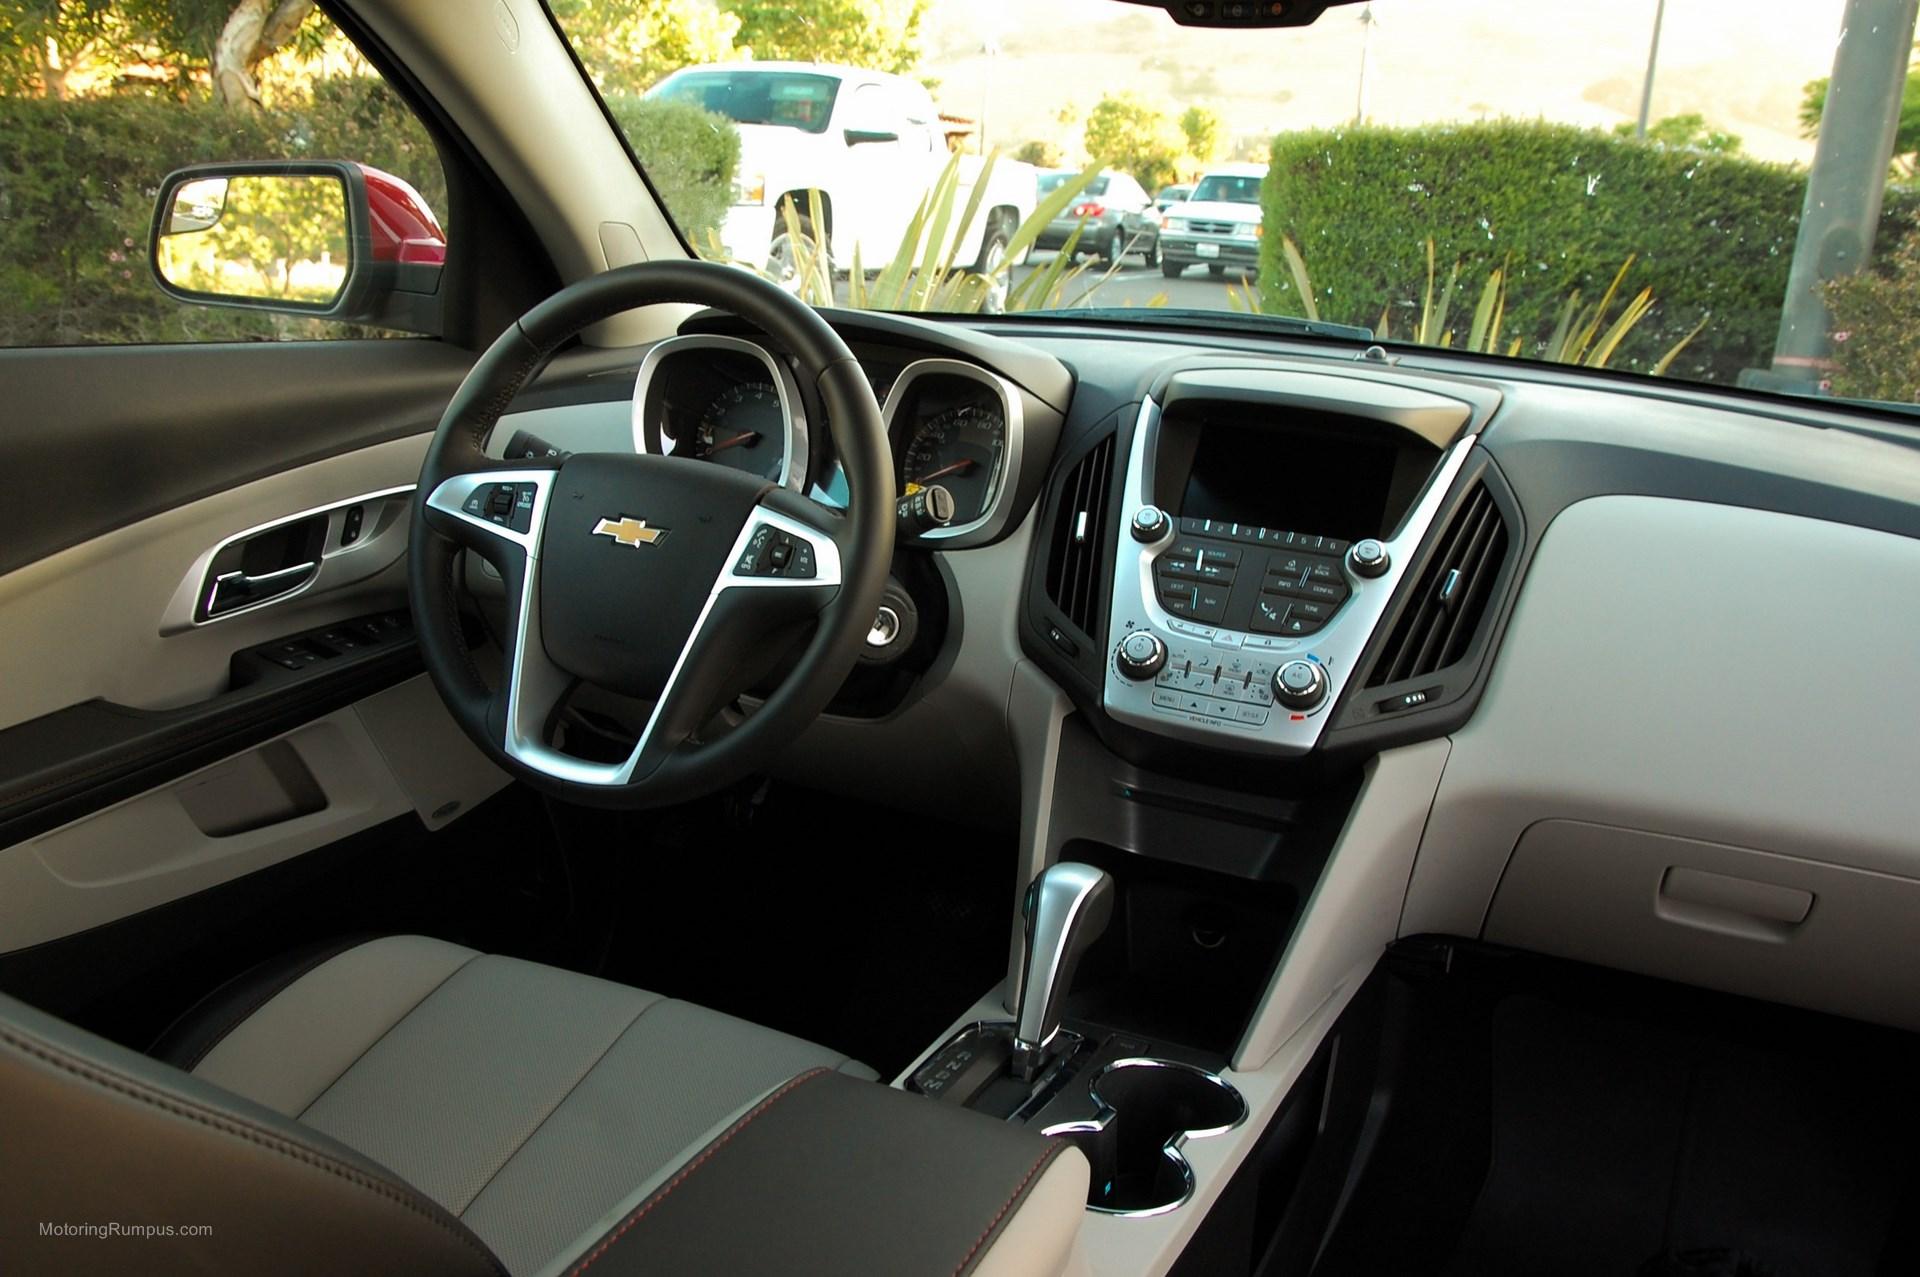 2014 Chevy Equinox Review - Motoring Rumpus